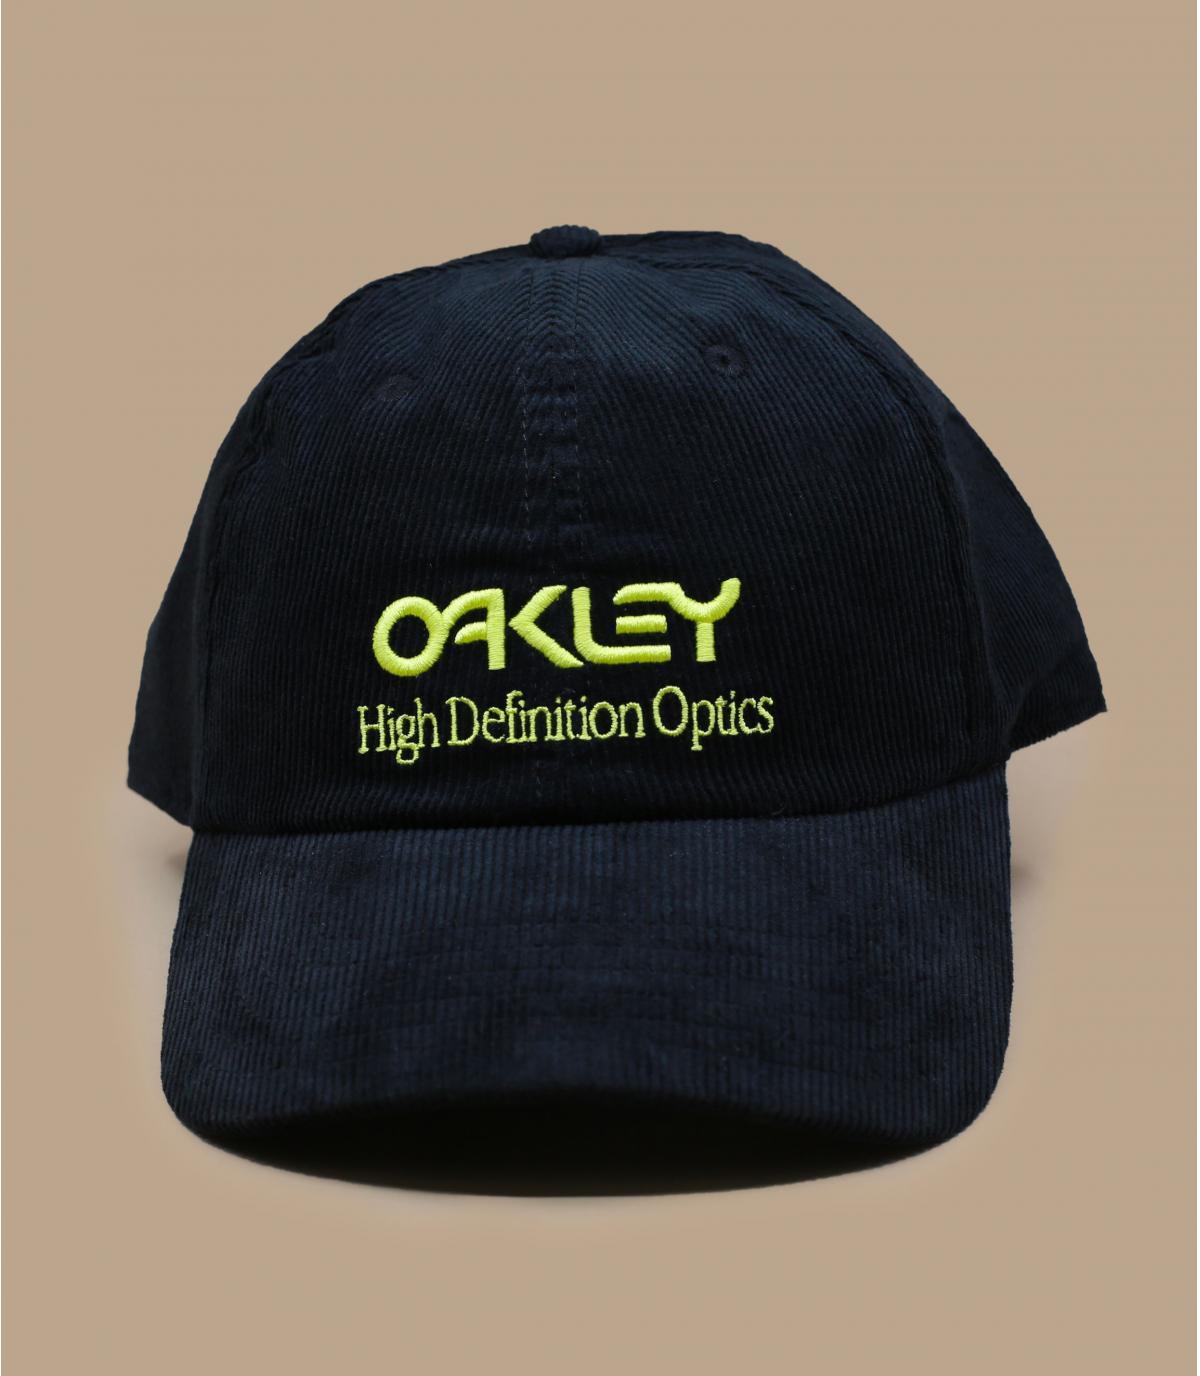 casquette Oakley velours noir